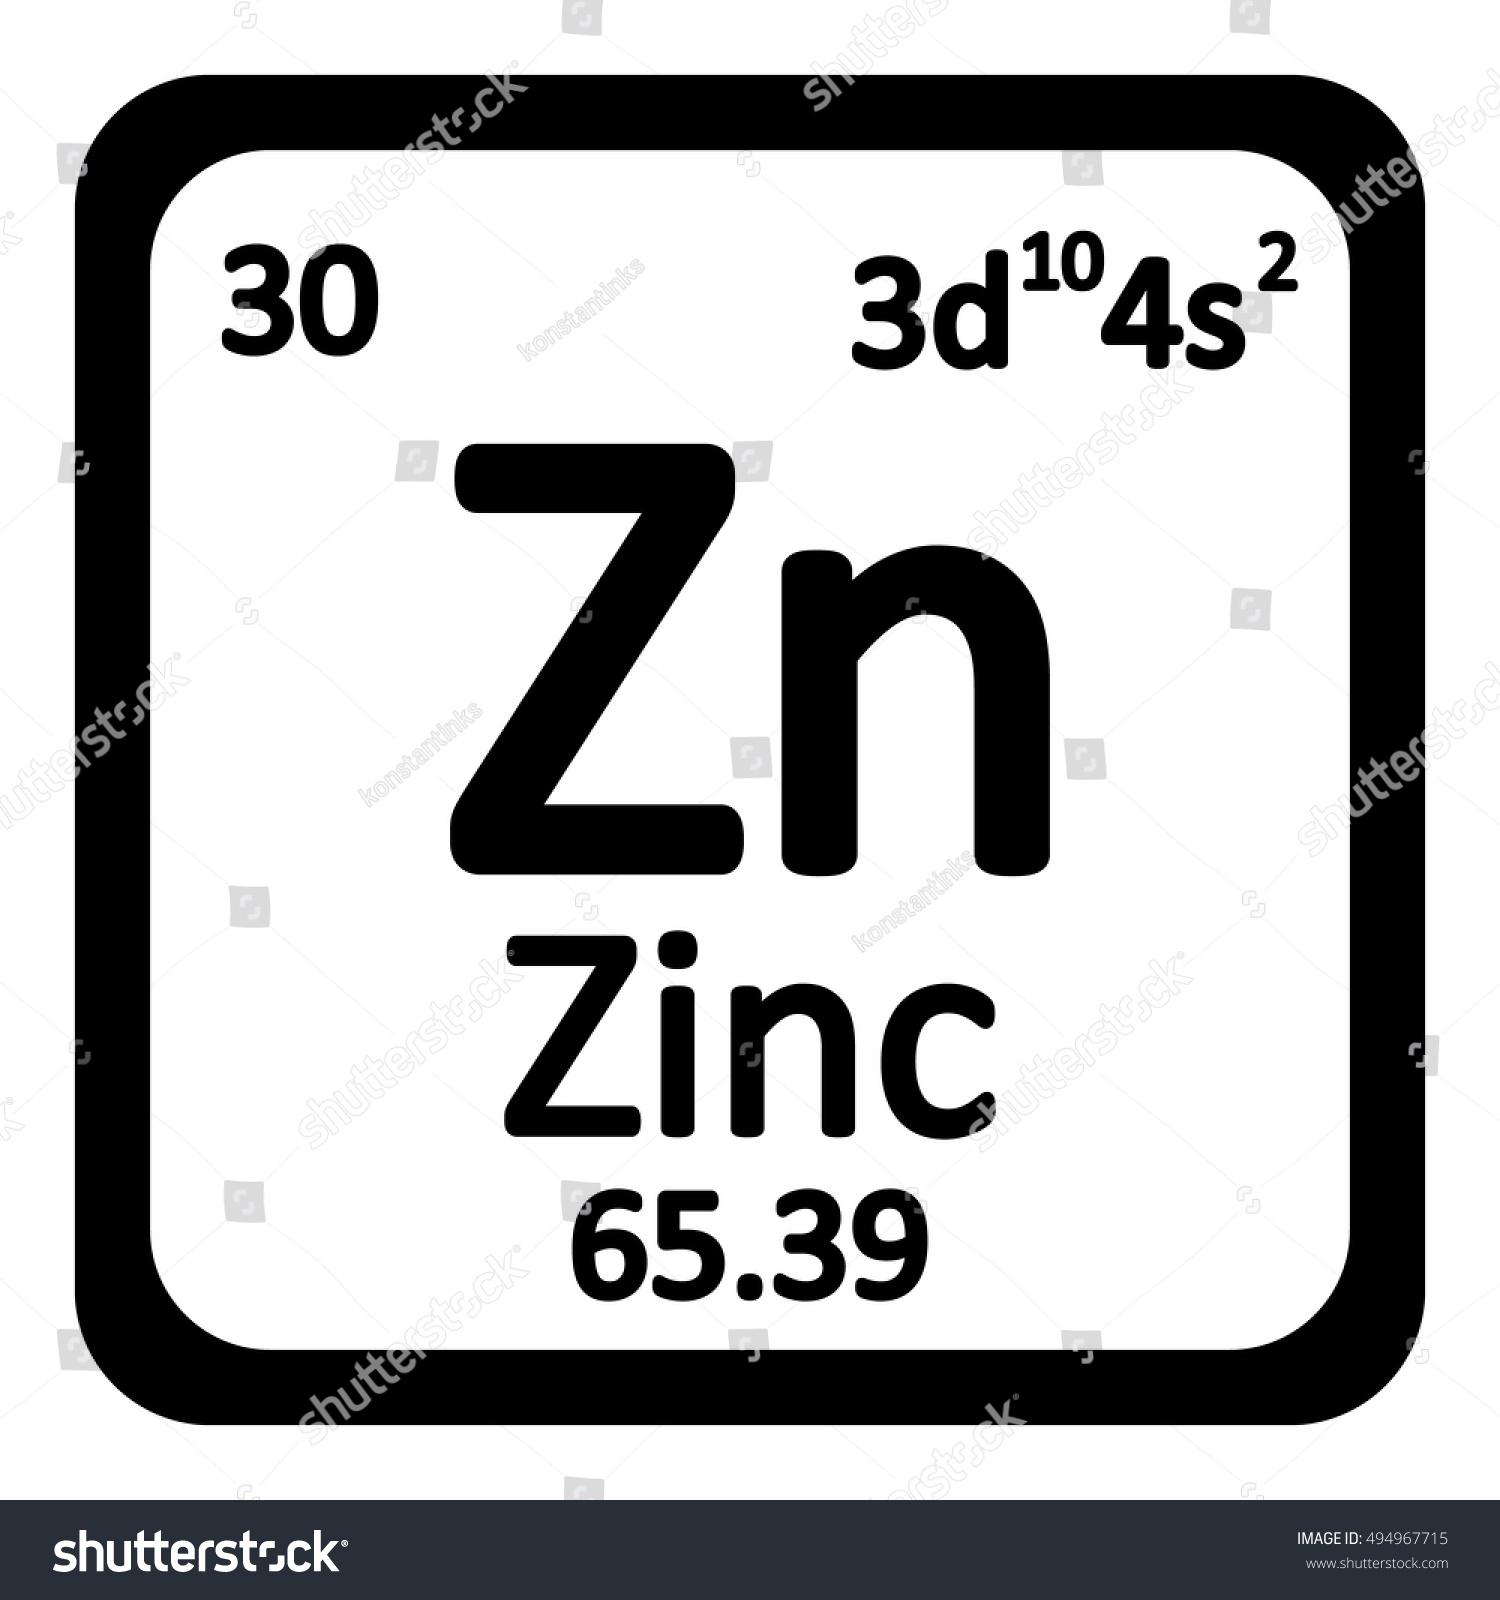 Periodic table element zinc icon on stock vector 494967715 periodic table element zinc icon on white background vector illustration gamestrikefo Gallery